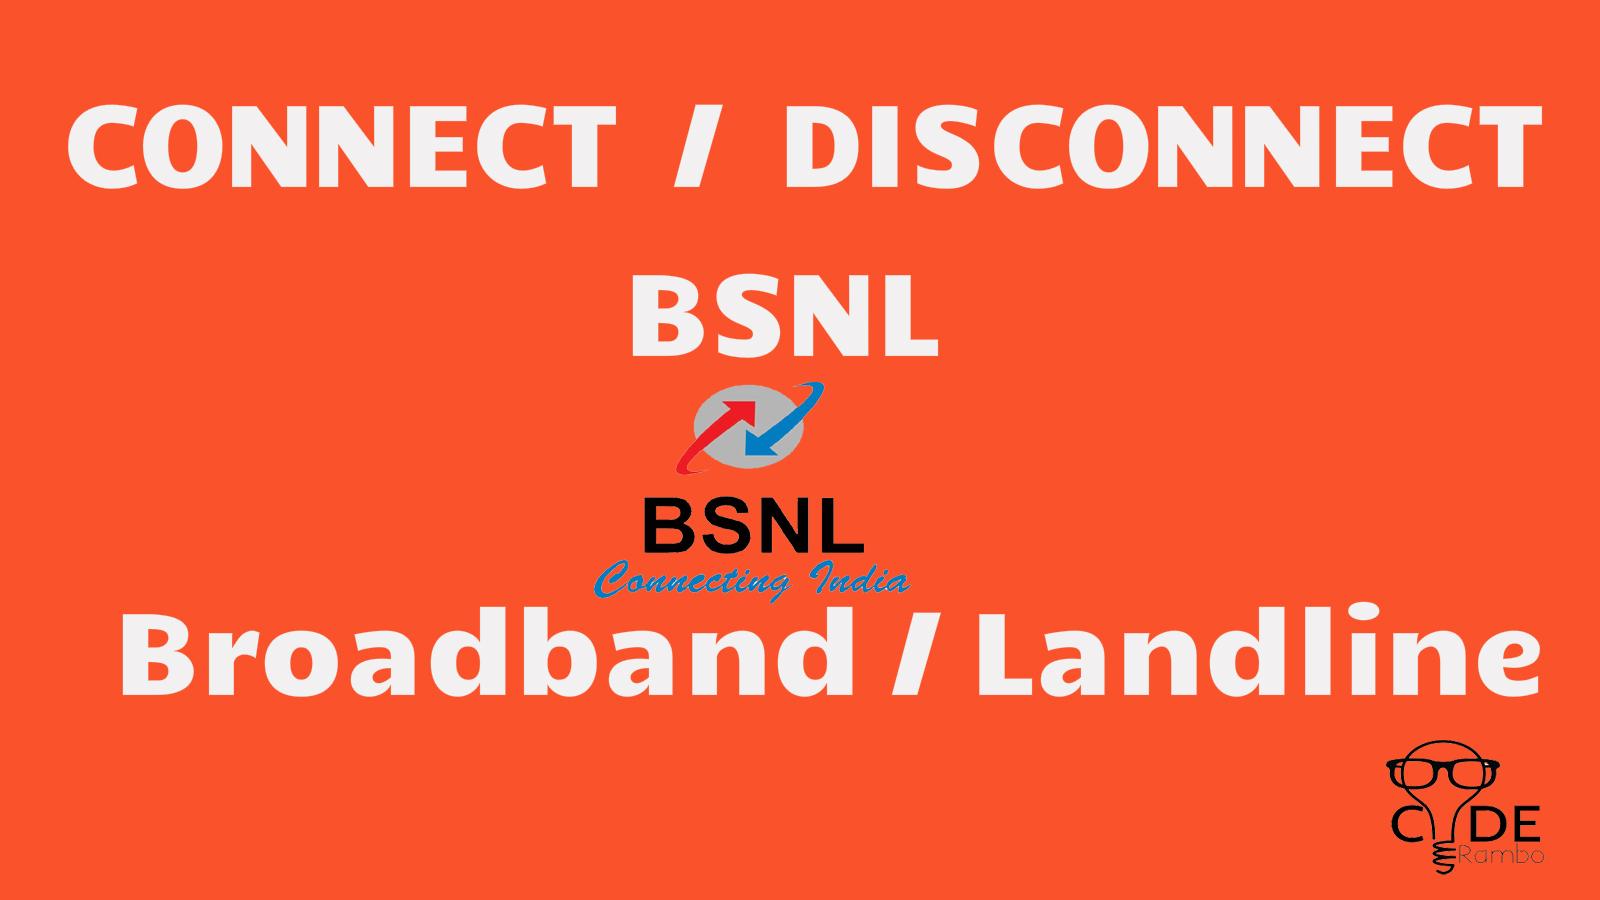 How to disconnectsurrender bsnl broadbandlandline online through how to disconnectsurrender bsnl broadbandlandline online through csc mechbit spiritdancerdesigns Gallery